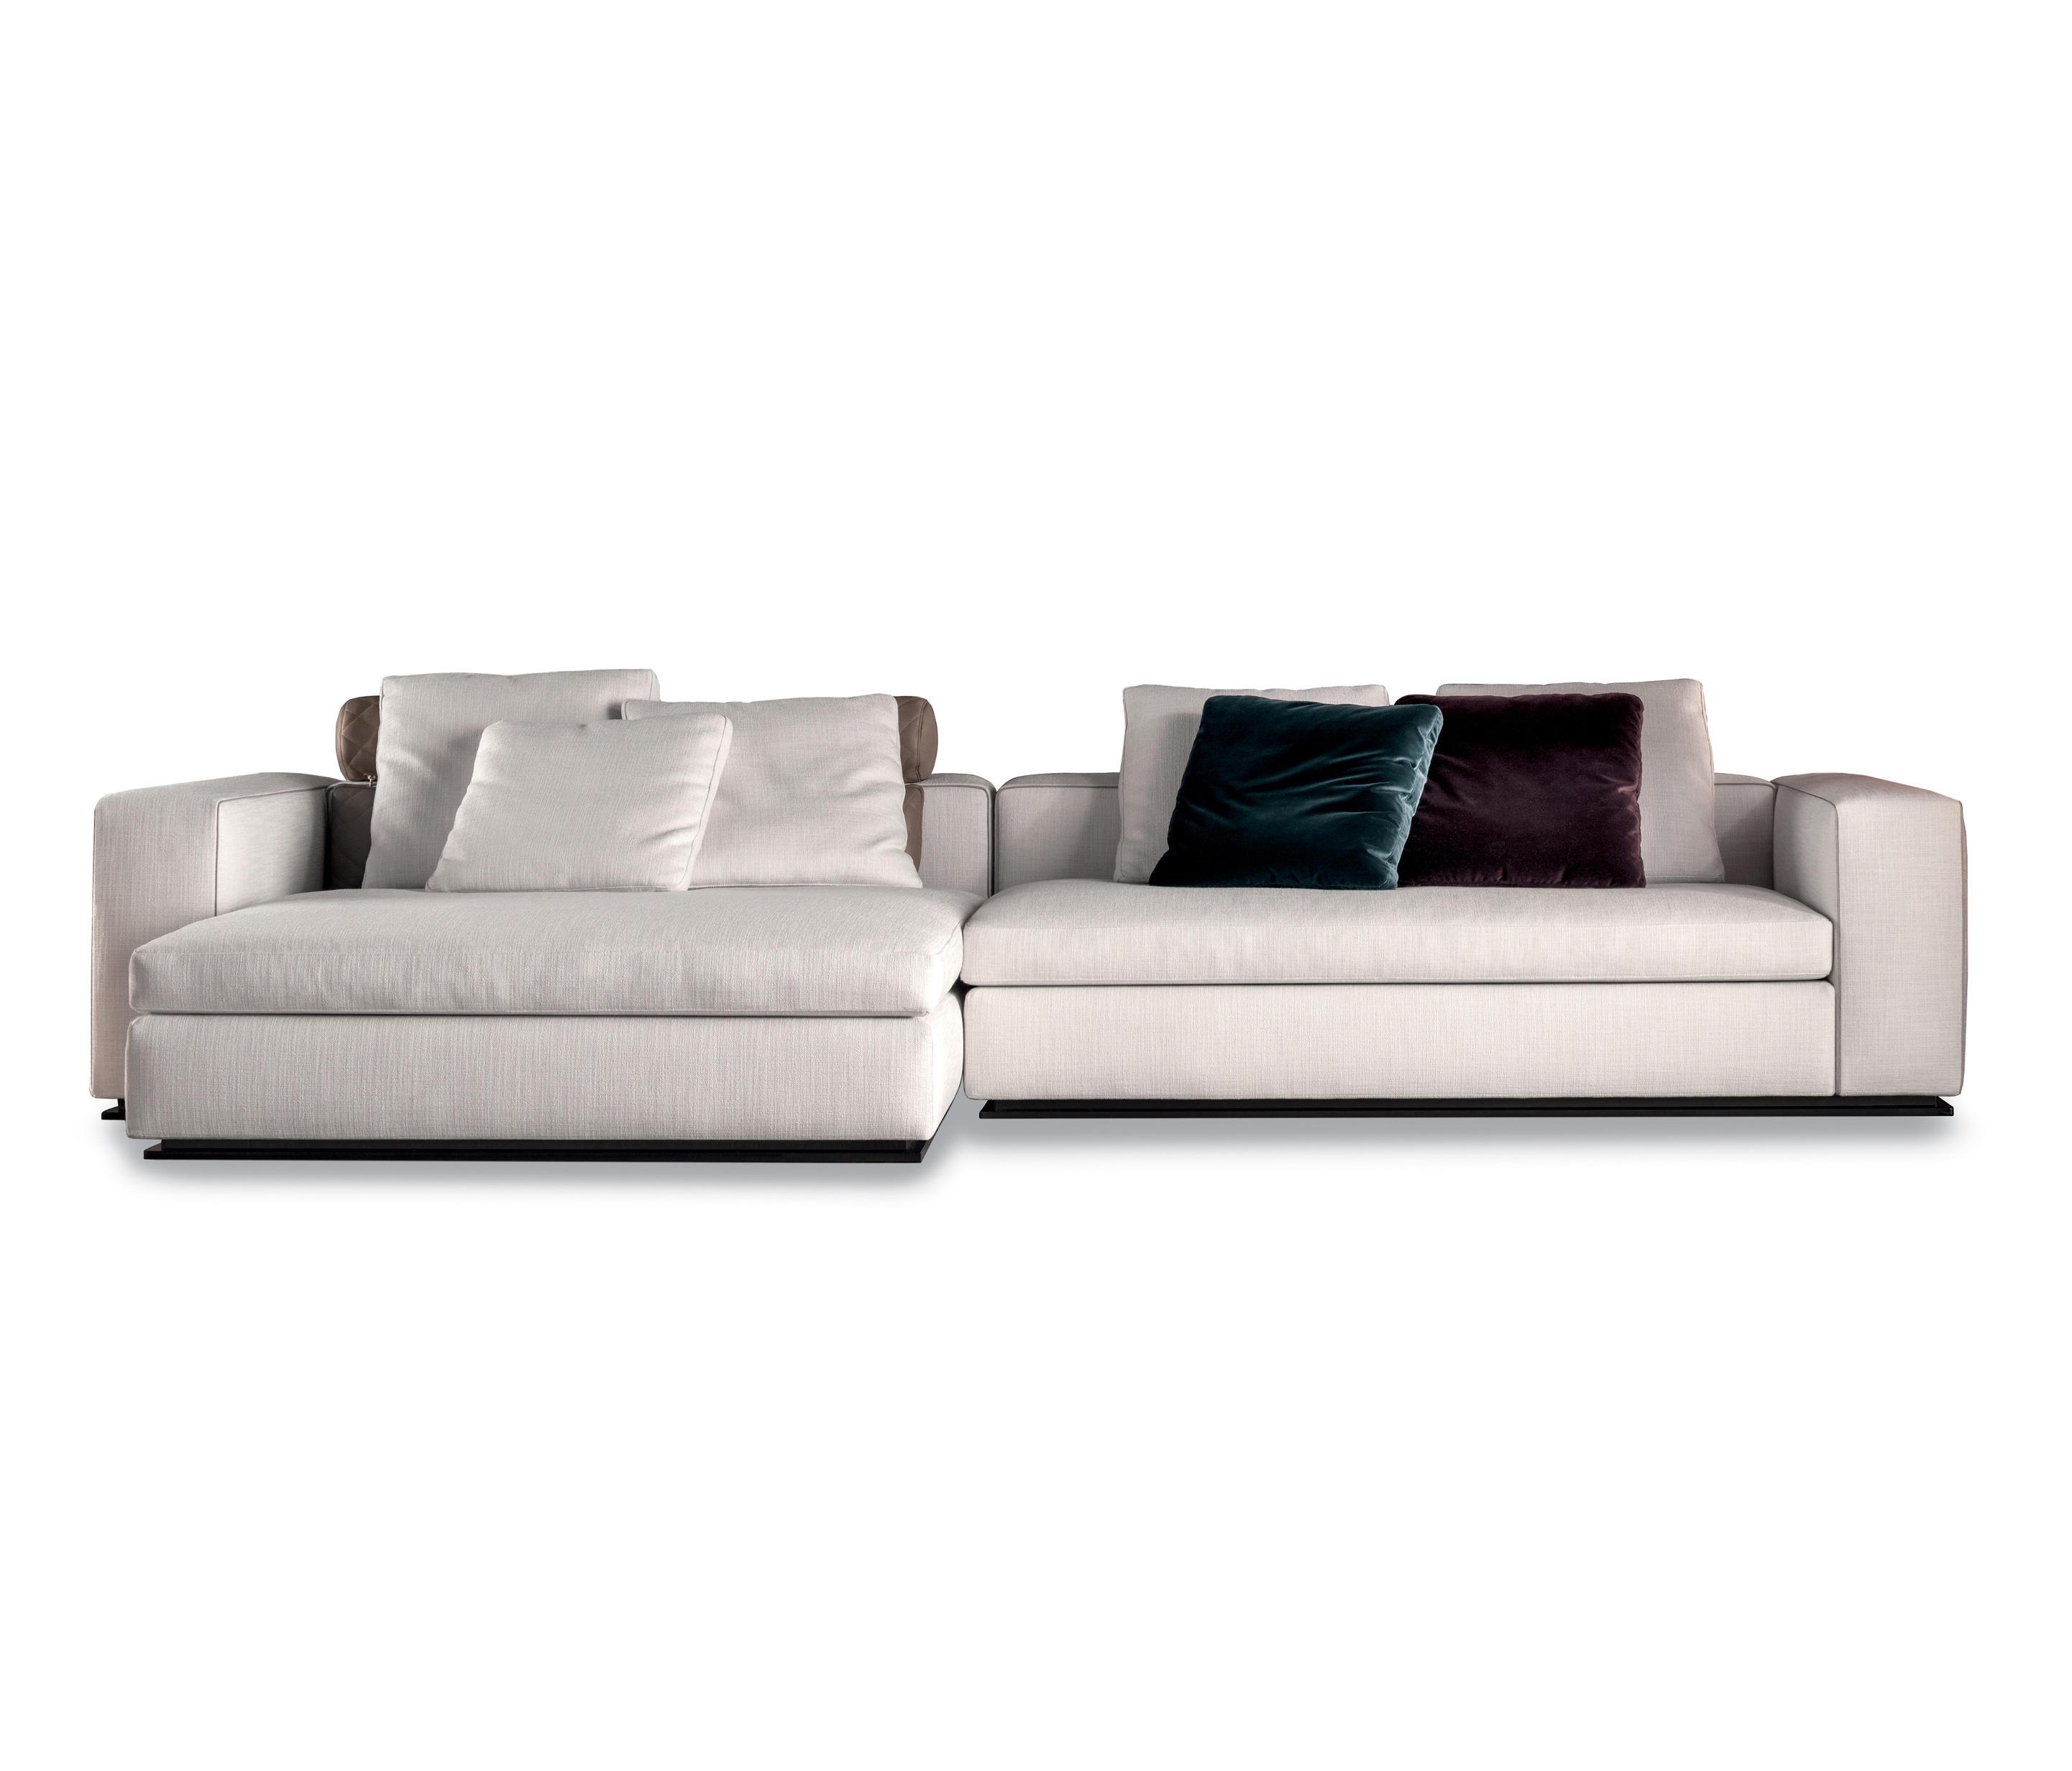 Leonard sofas from minotti architonic - Divano minotti prezzo ...